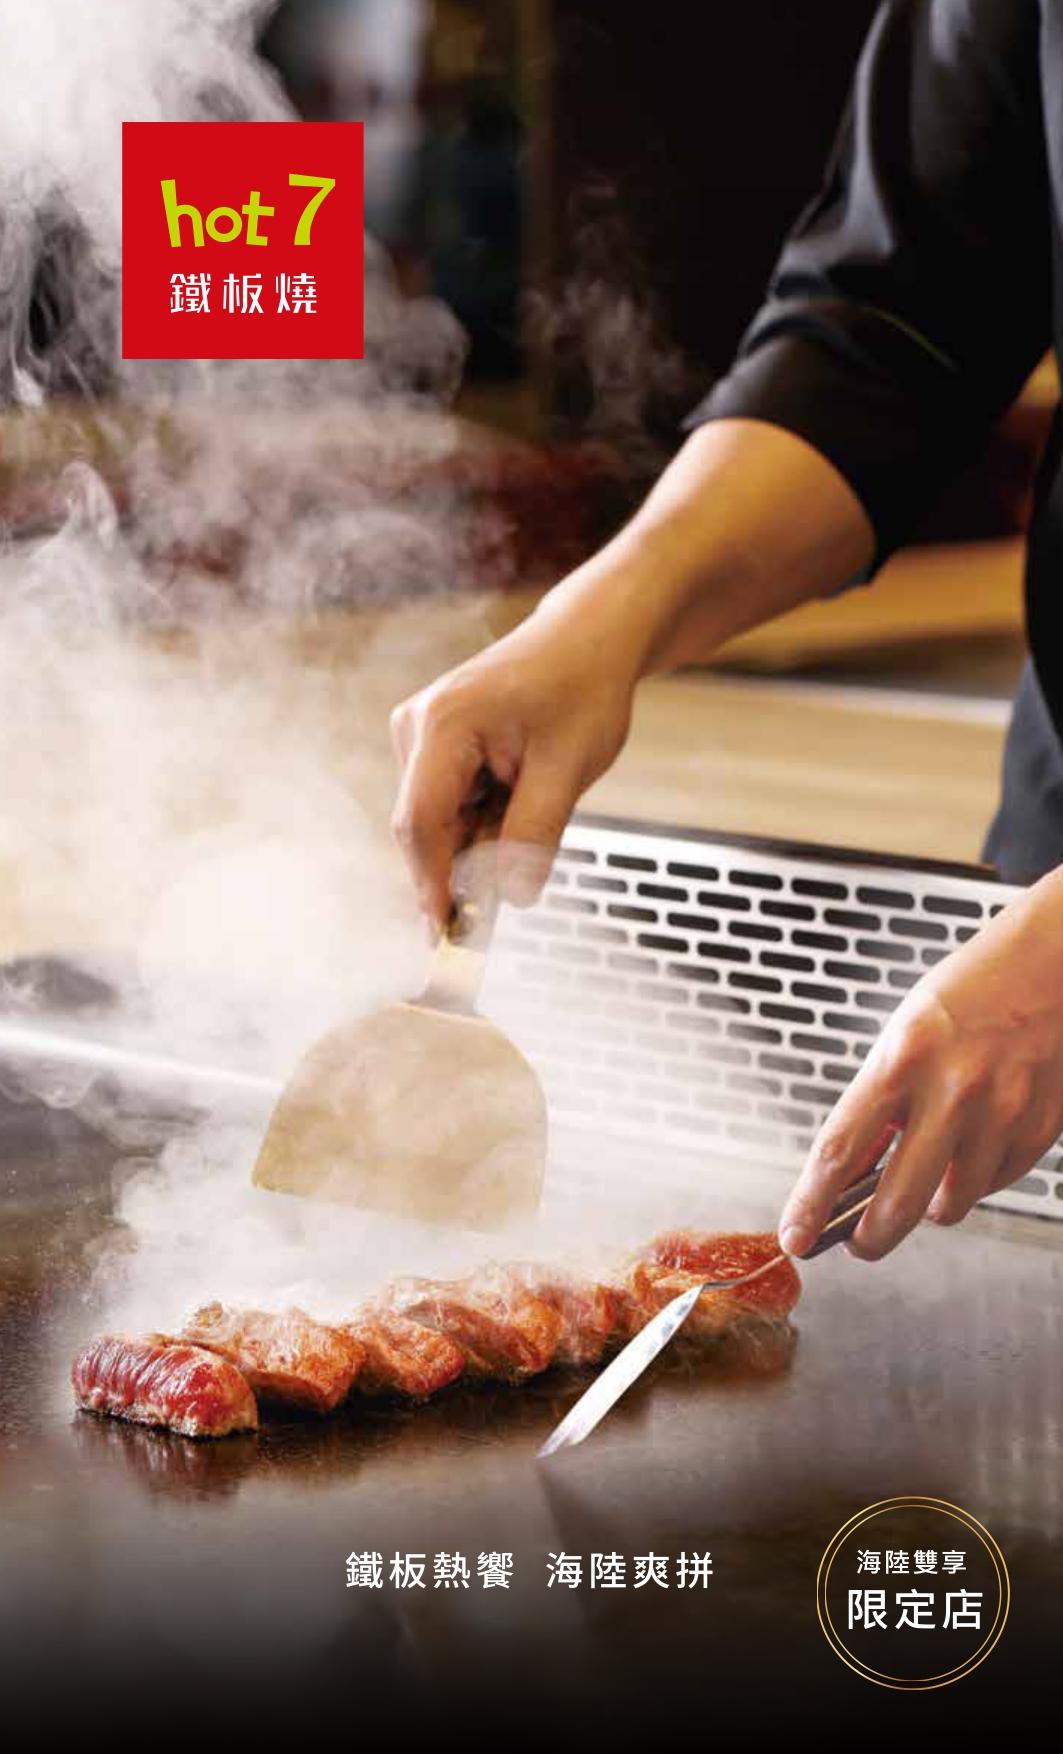 hot7海陸雙享限定店菜單MENU